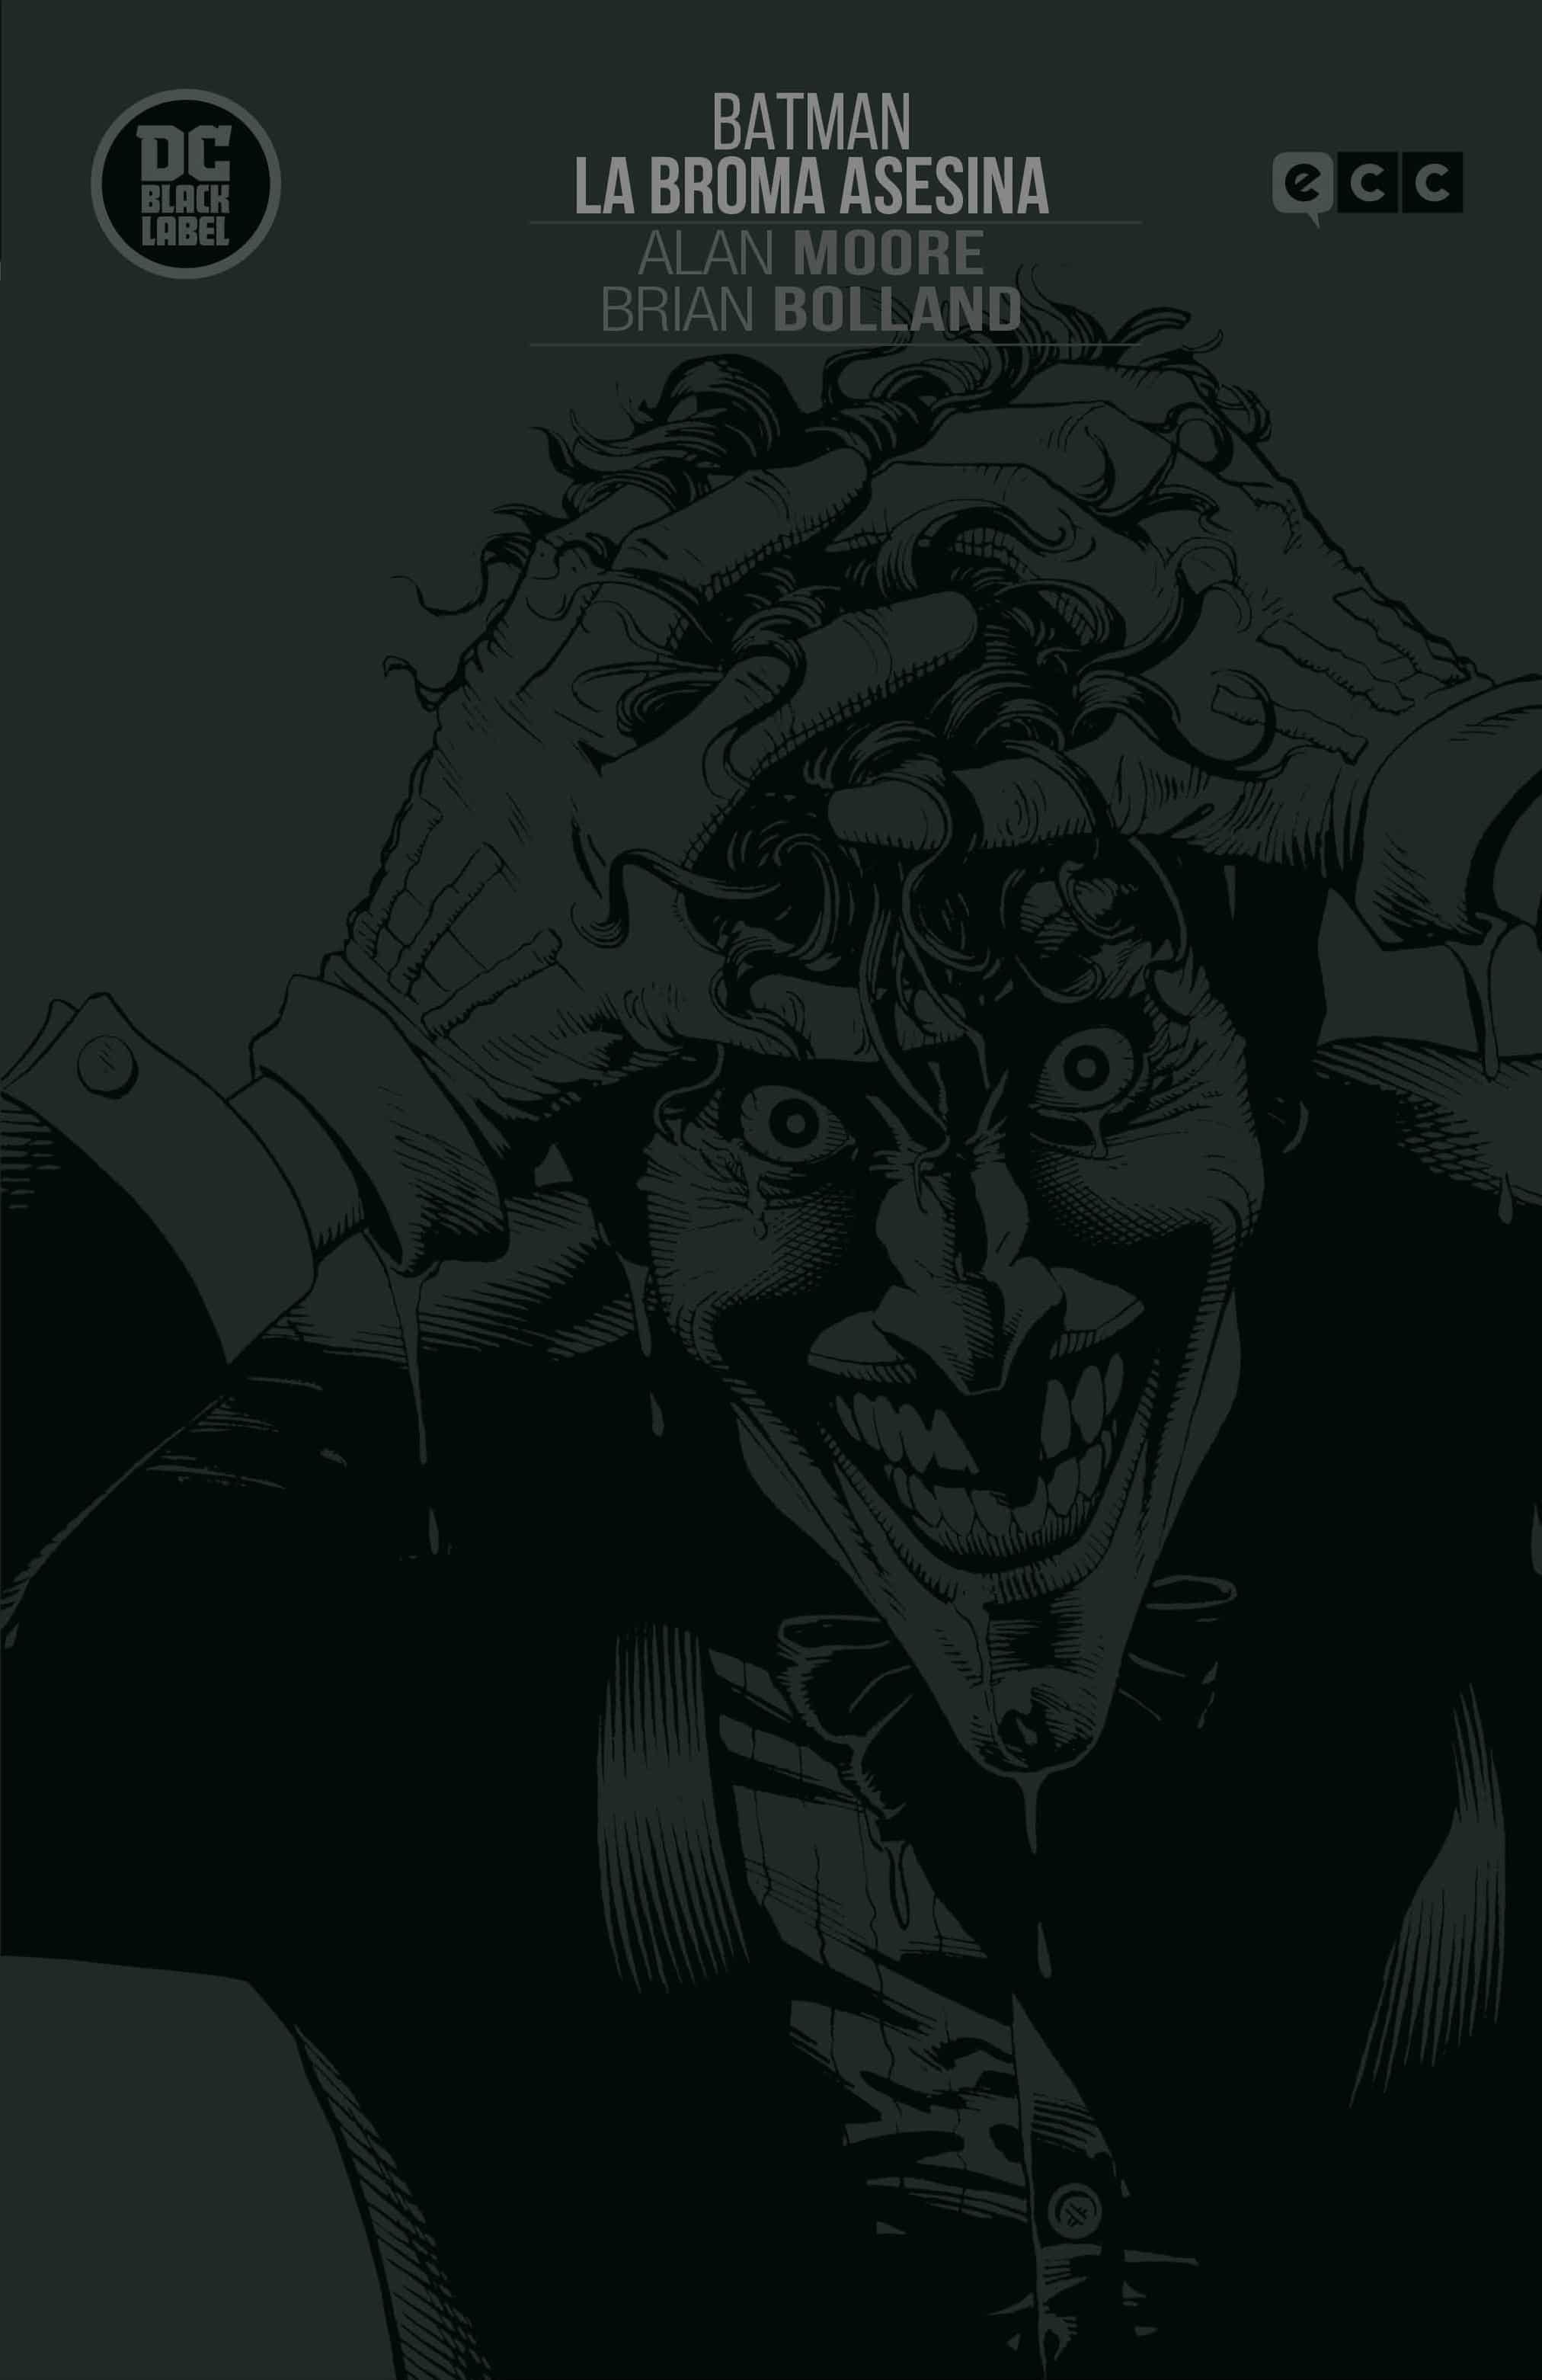 batman: la broma asesina - edicion black label-alan moore-9788417722180